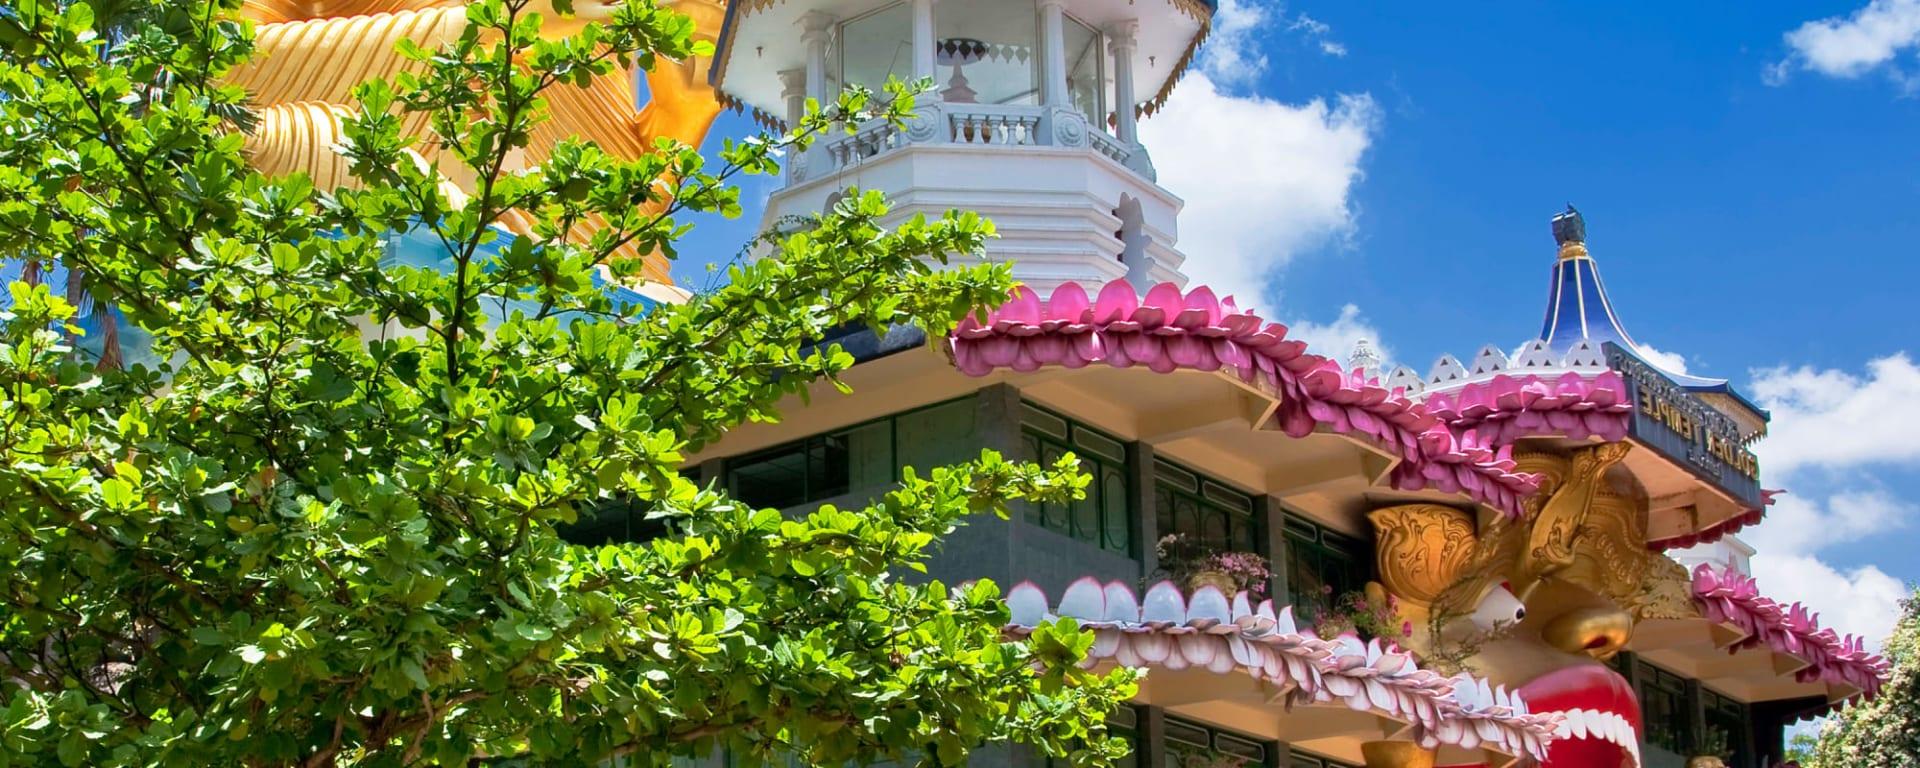 Familienabenteuer Sri Lanka ab Colombo: Sri Lanka Dambulla